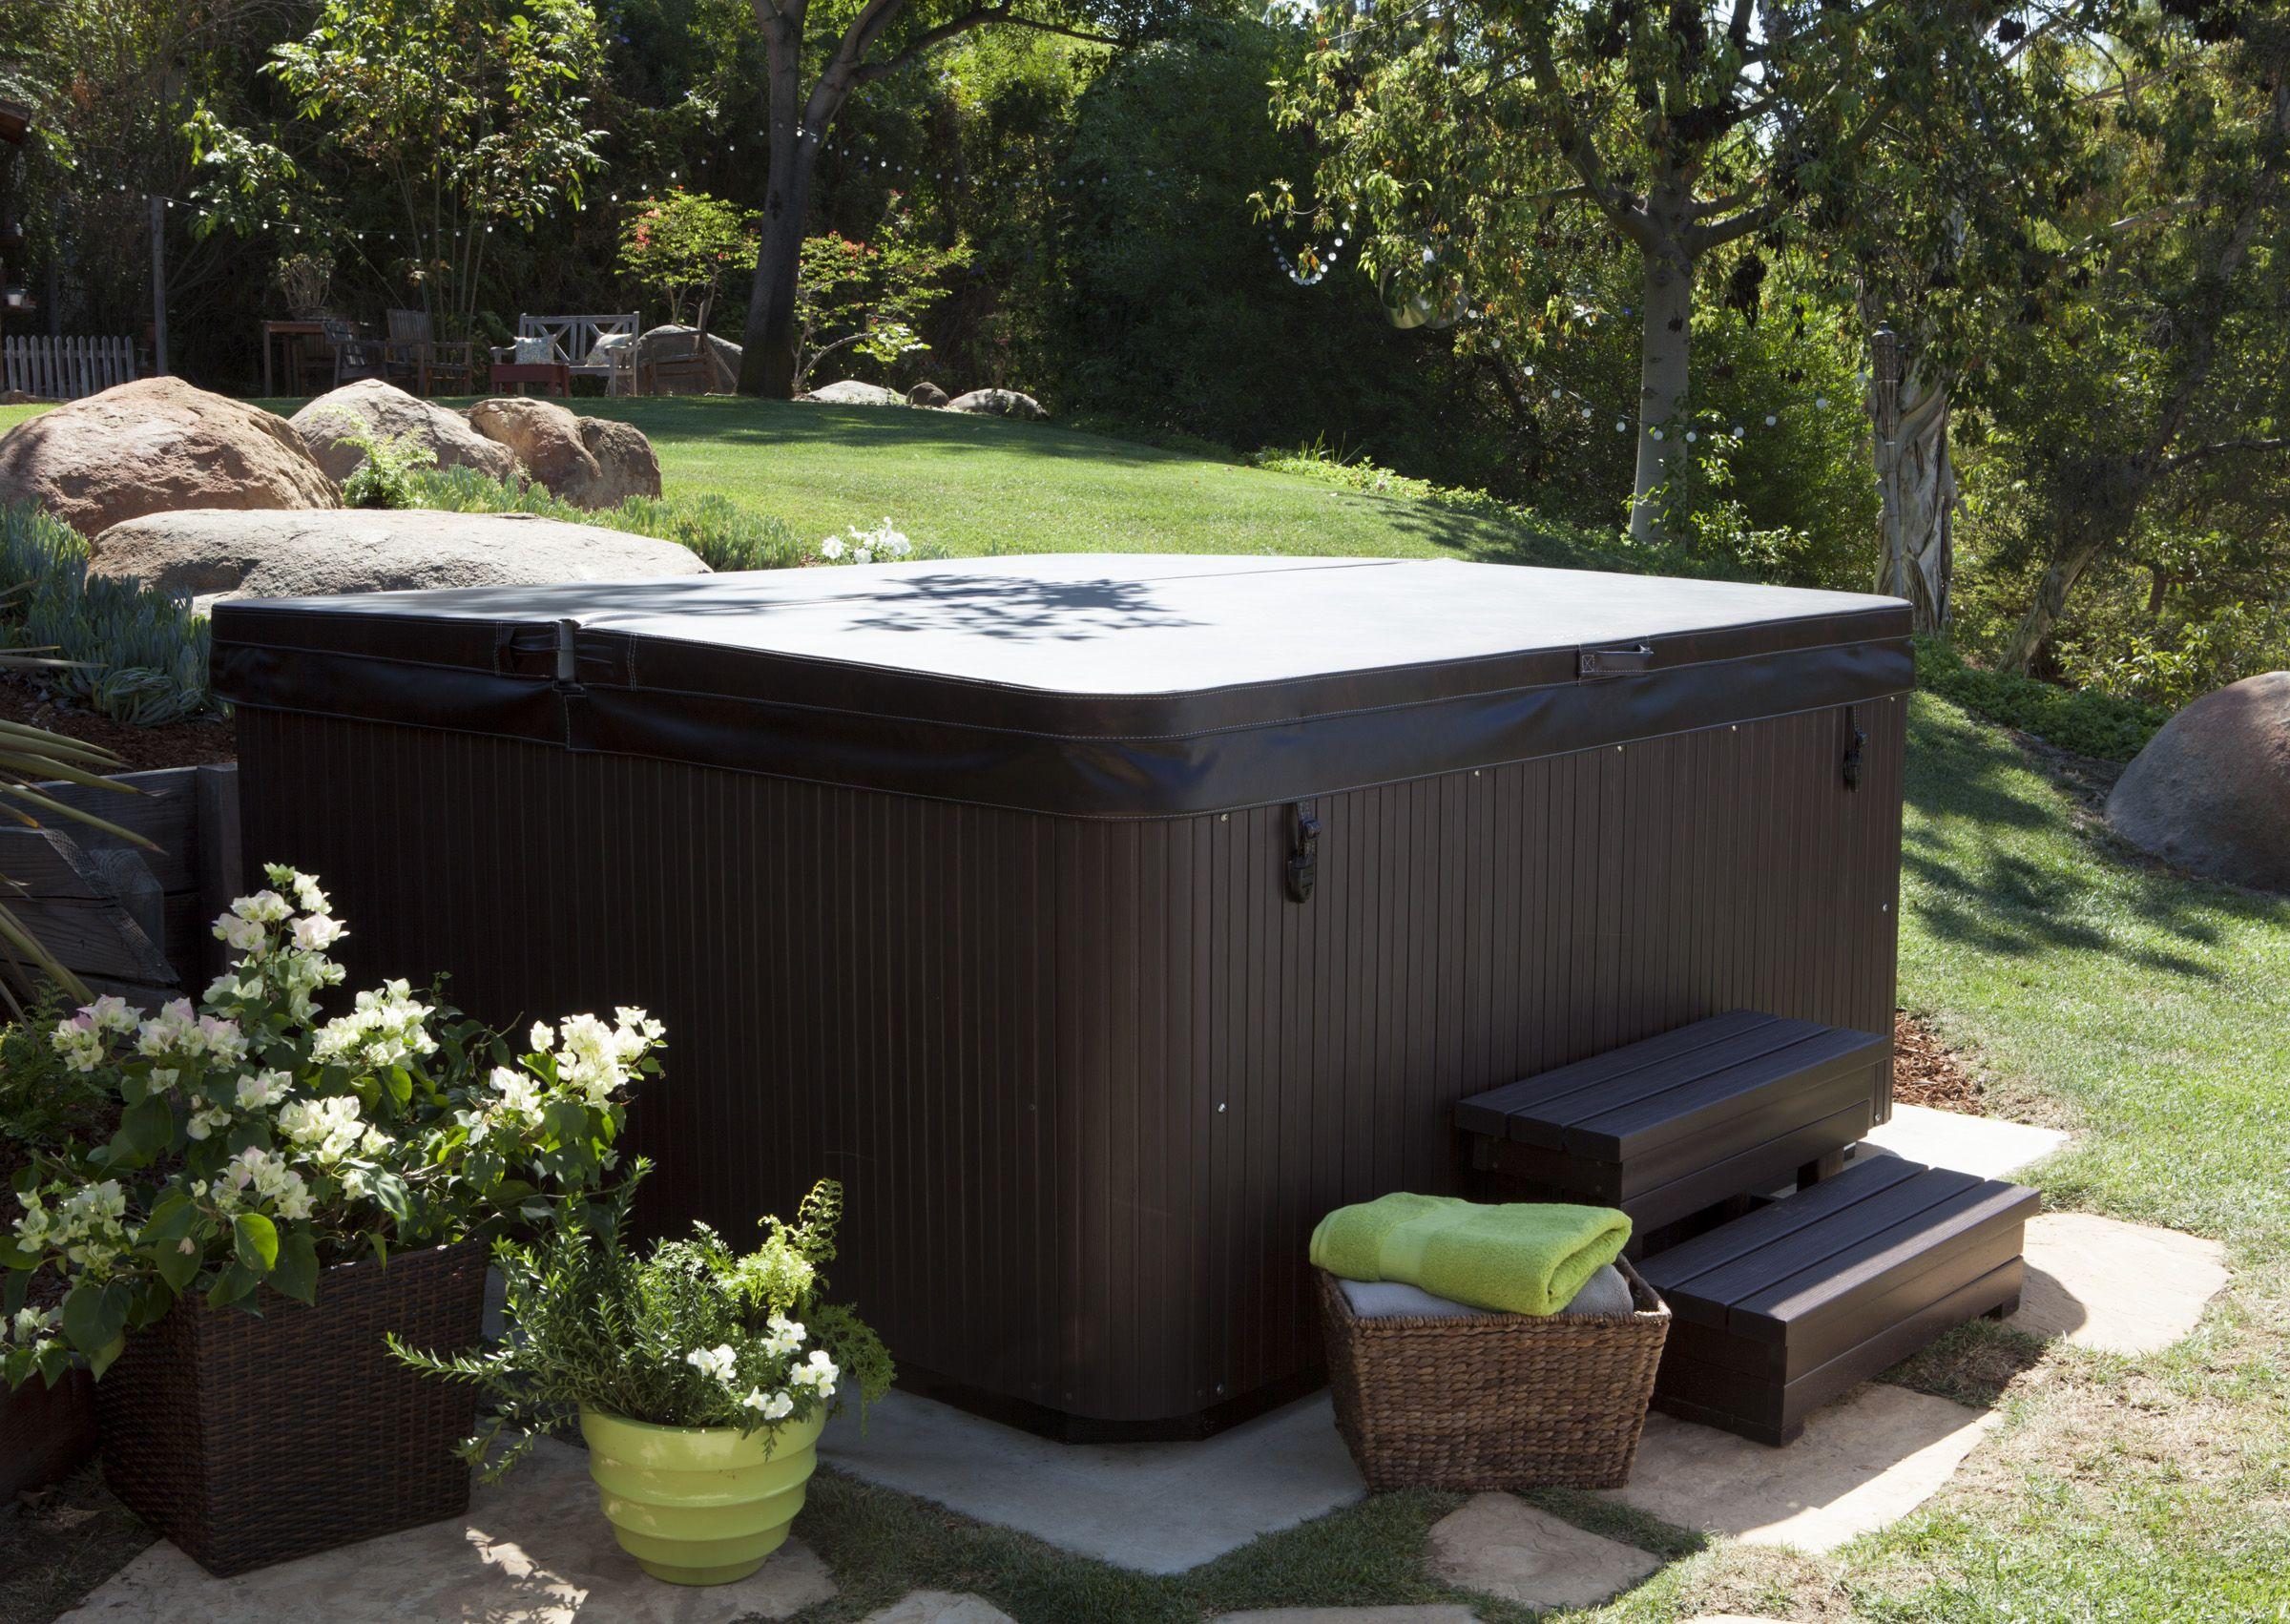 prices comparison tub price l hot group spas utah tubs bullfrog springs